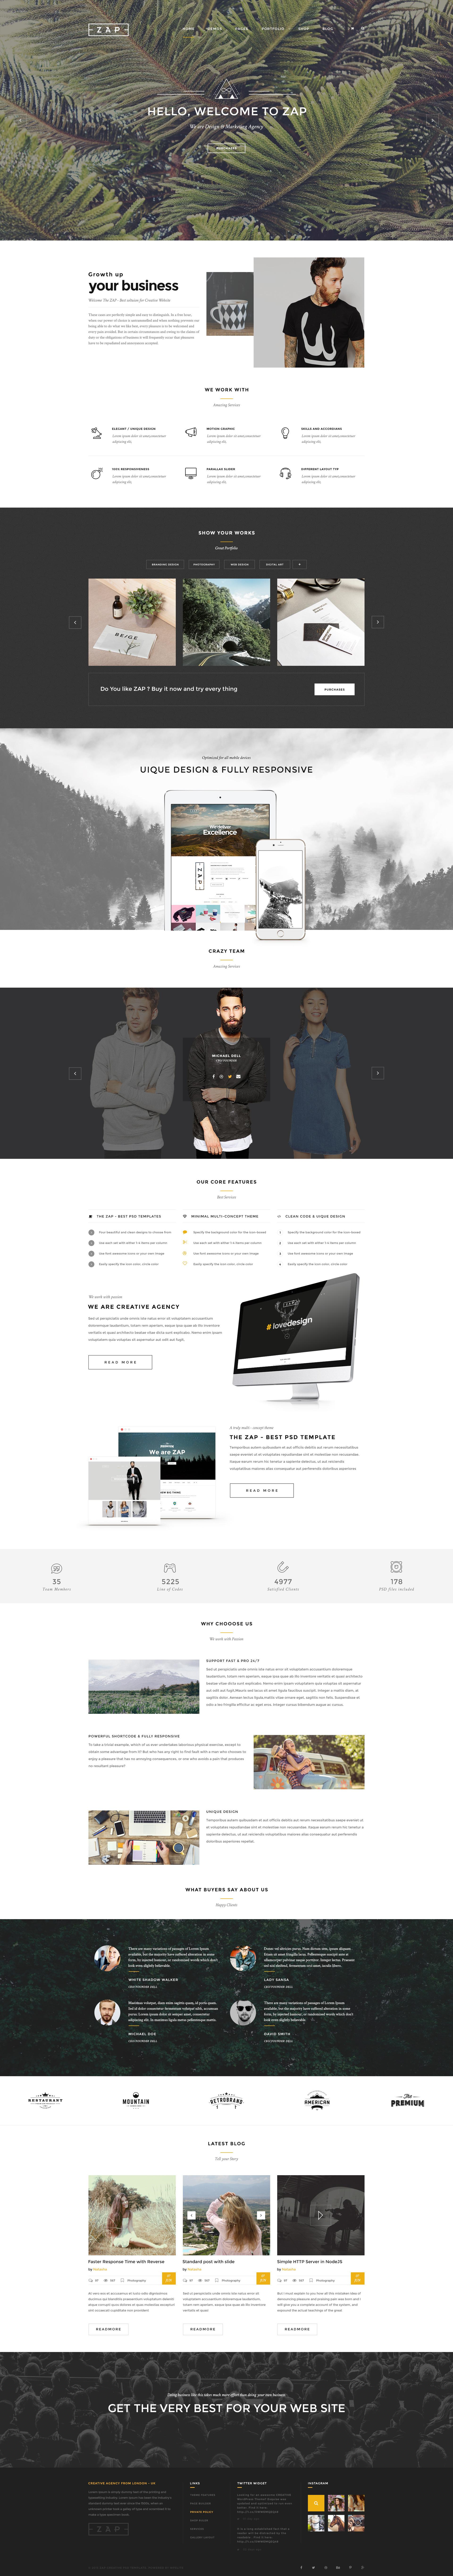 ZAP - Creative PSD Template by LA-Studio | ThemeForest